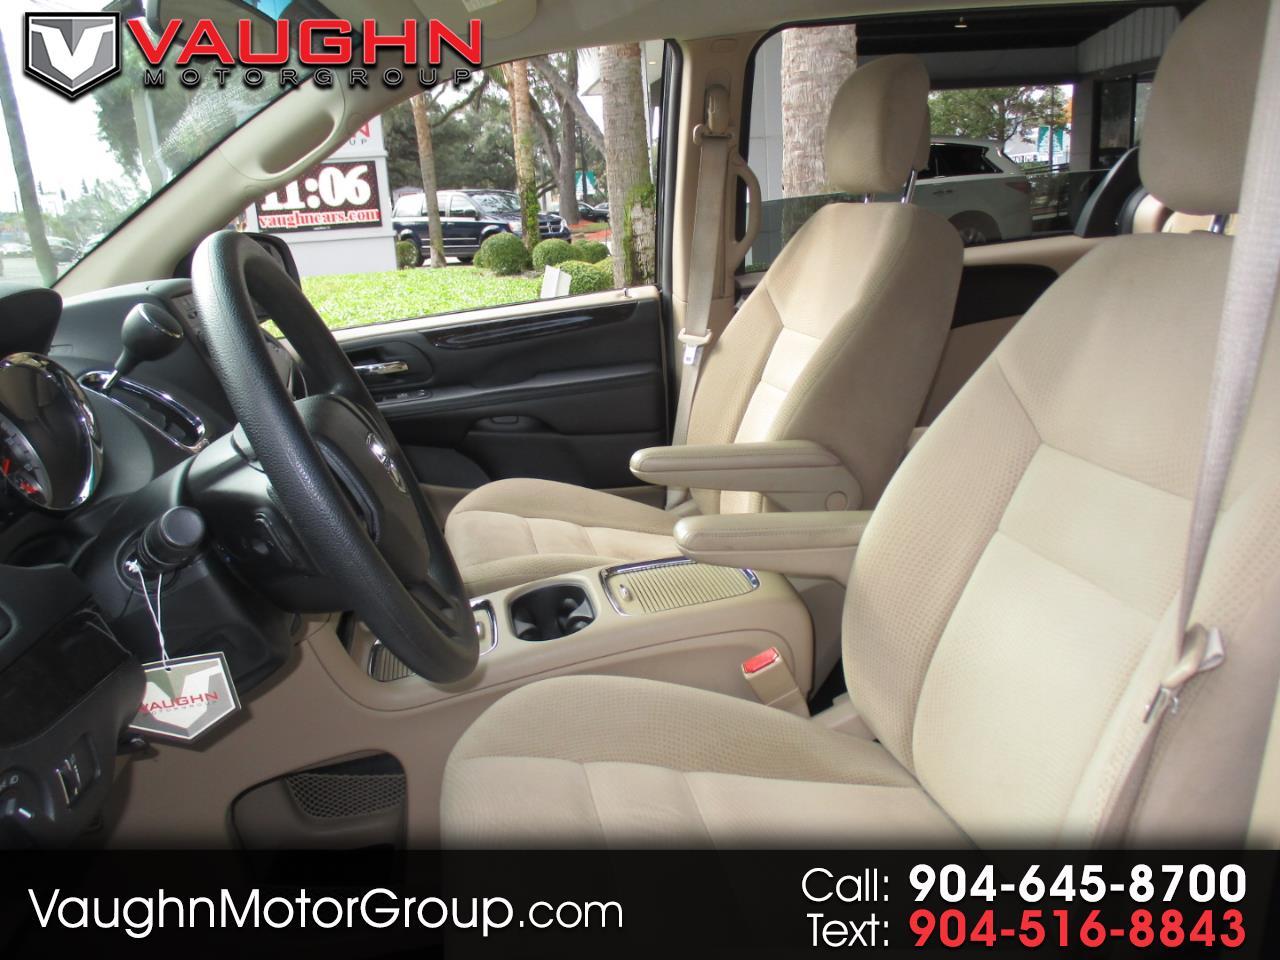 2016 Dodge Grand Caravan 4dr Wgn SXT